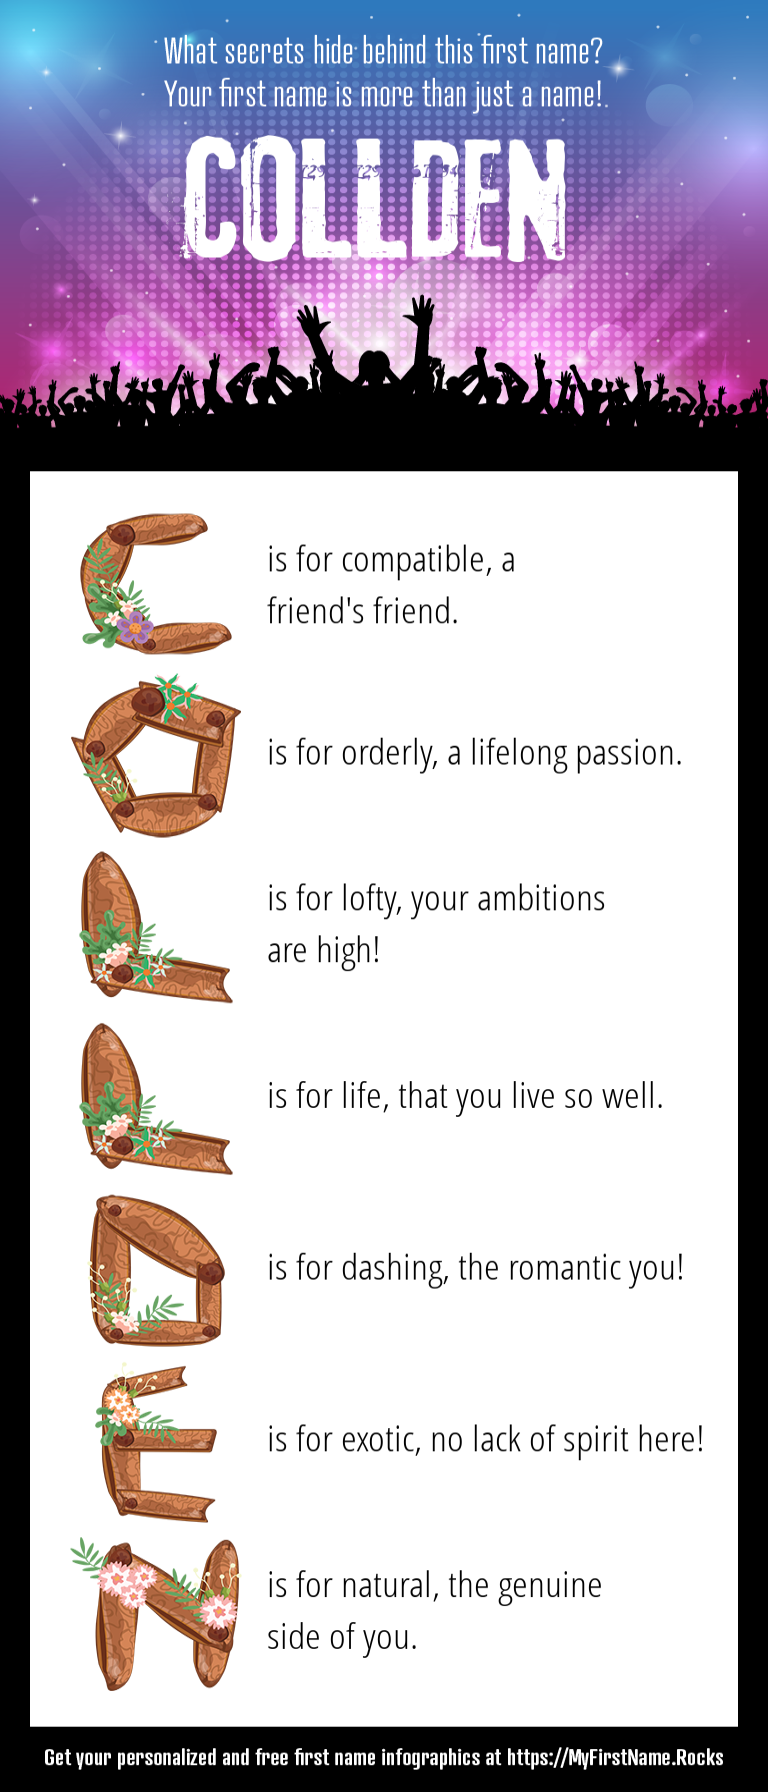 Collden Infographics